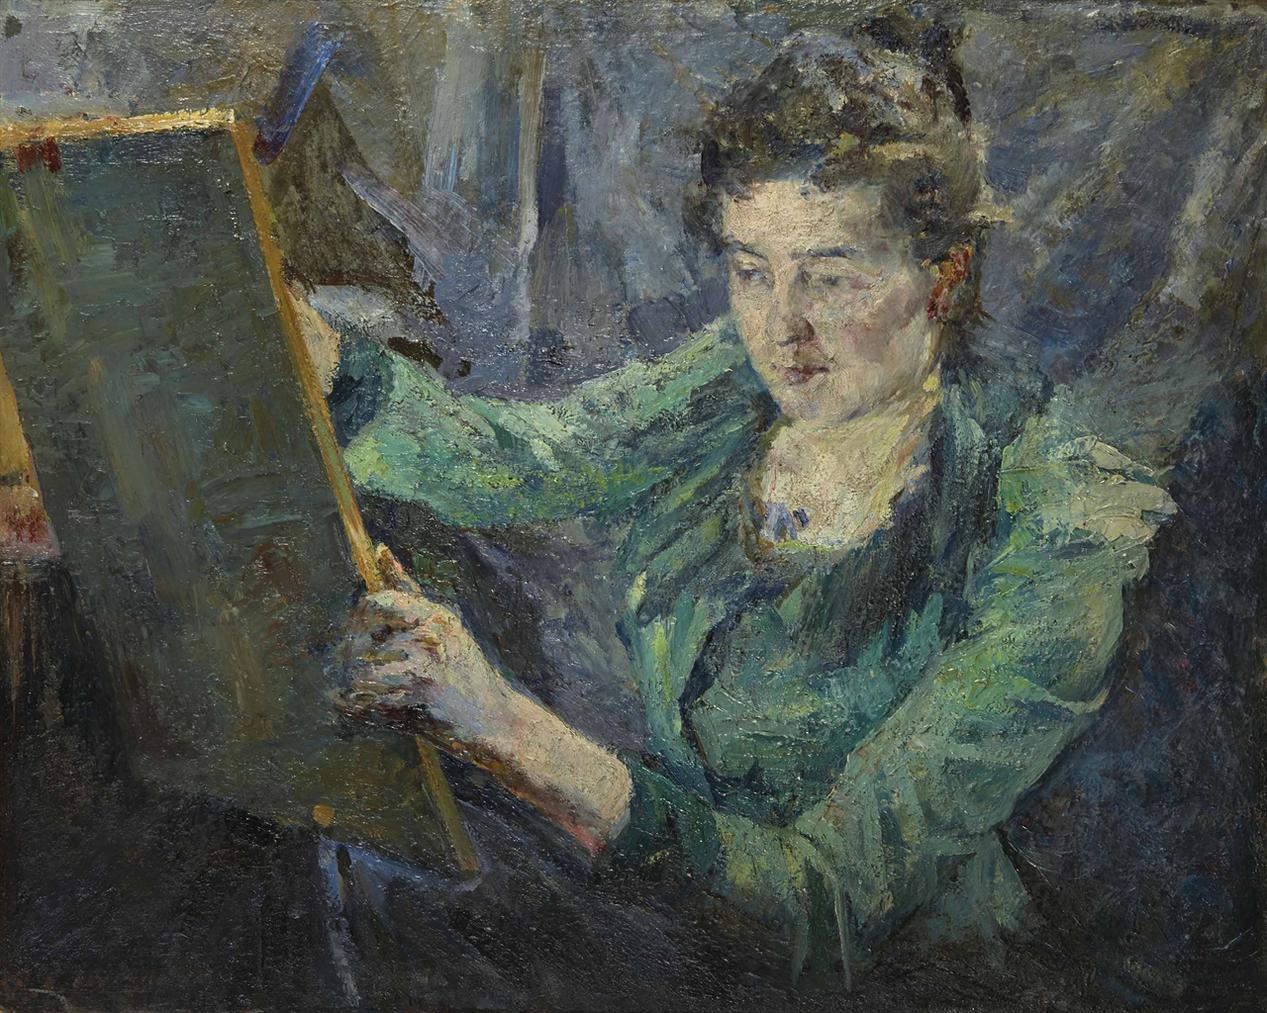 Raphael Lewisohn - Portrait De Mary Cassatt Dans Son Atelier-